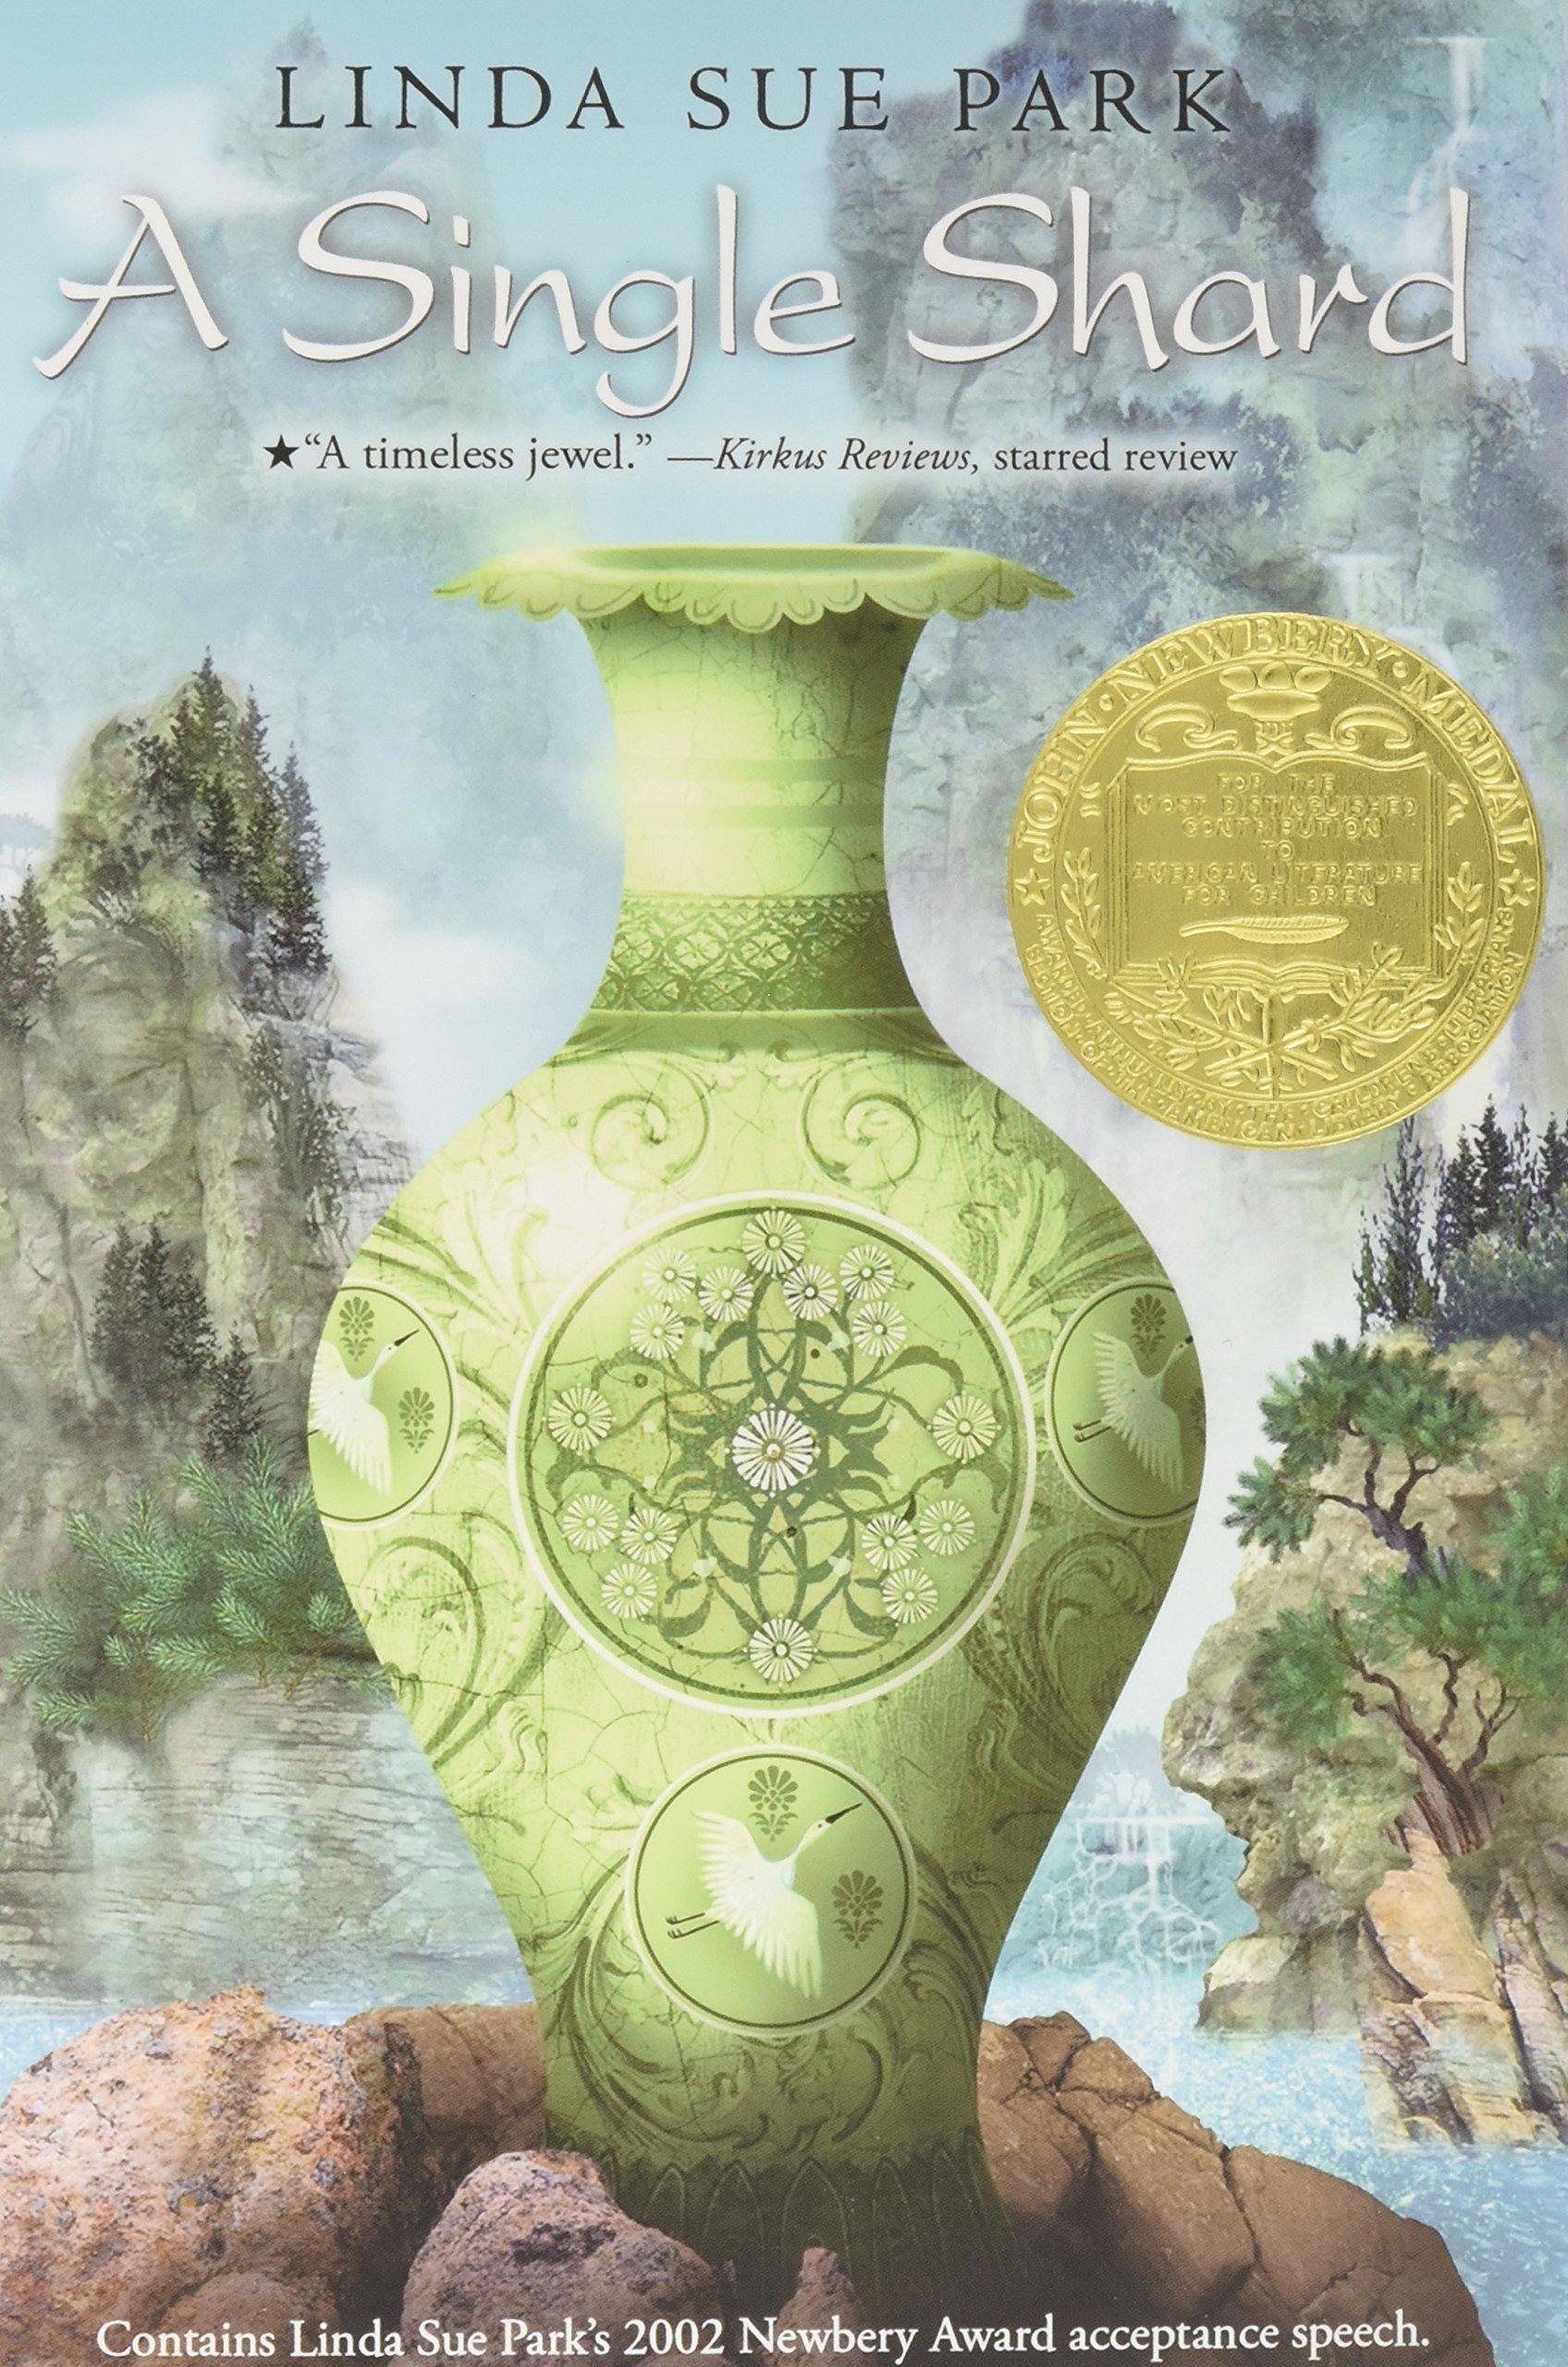 A Single Shard: Linda Sue Park: 8580001055770: Amazon com: Books